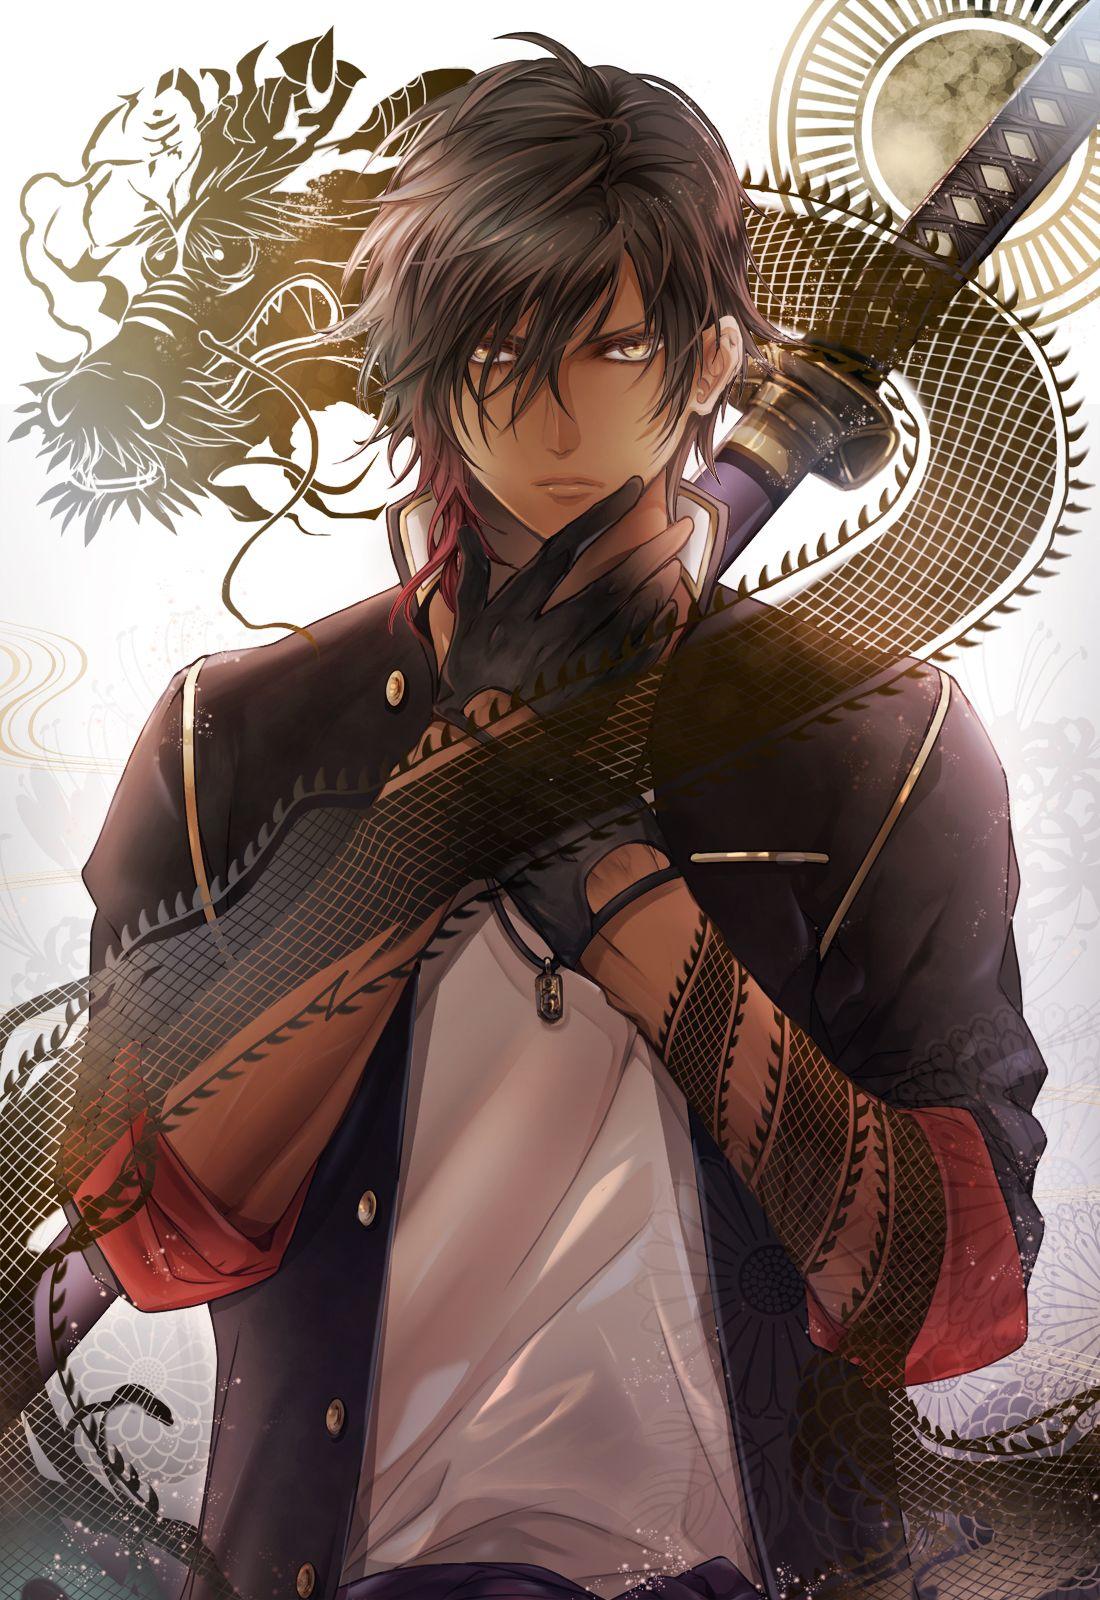 Ookurikara Touken Ranbu Mobile Wallpaper 1848404 Zerochan Anime Image Board Touken Ranbu Handsome Anime Anime Boy